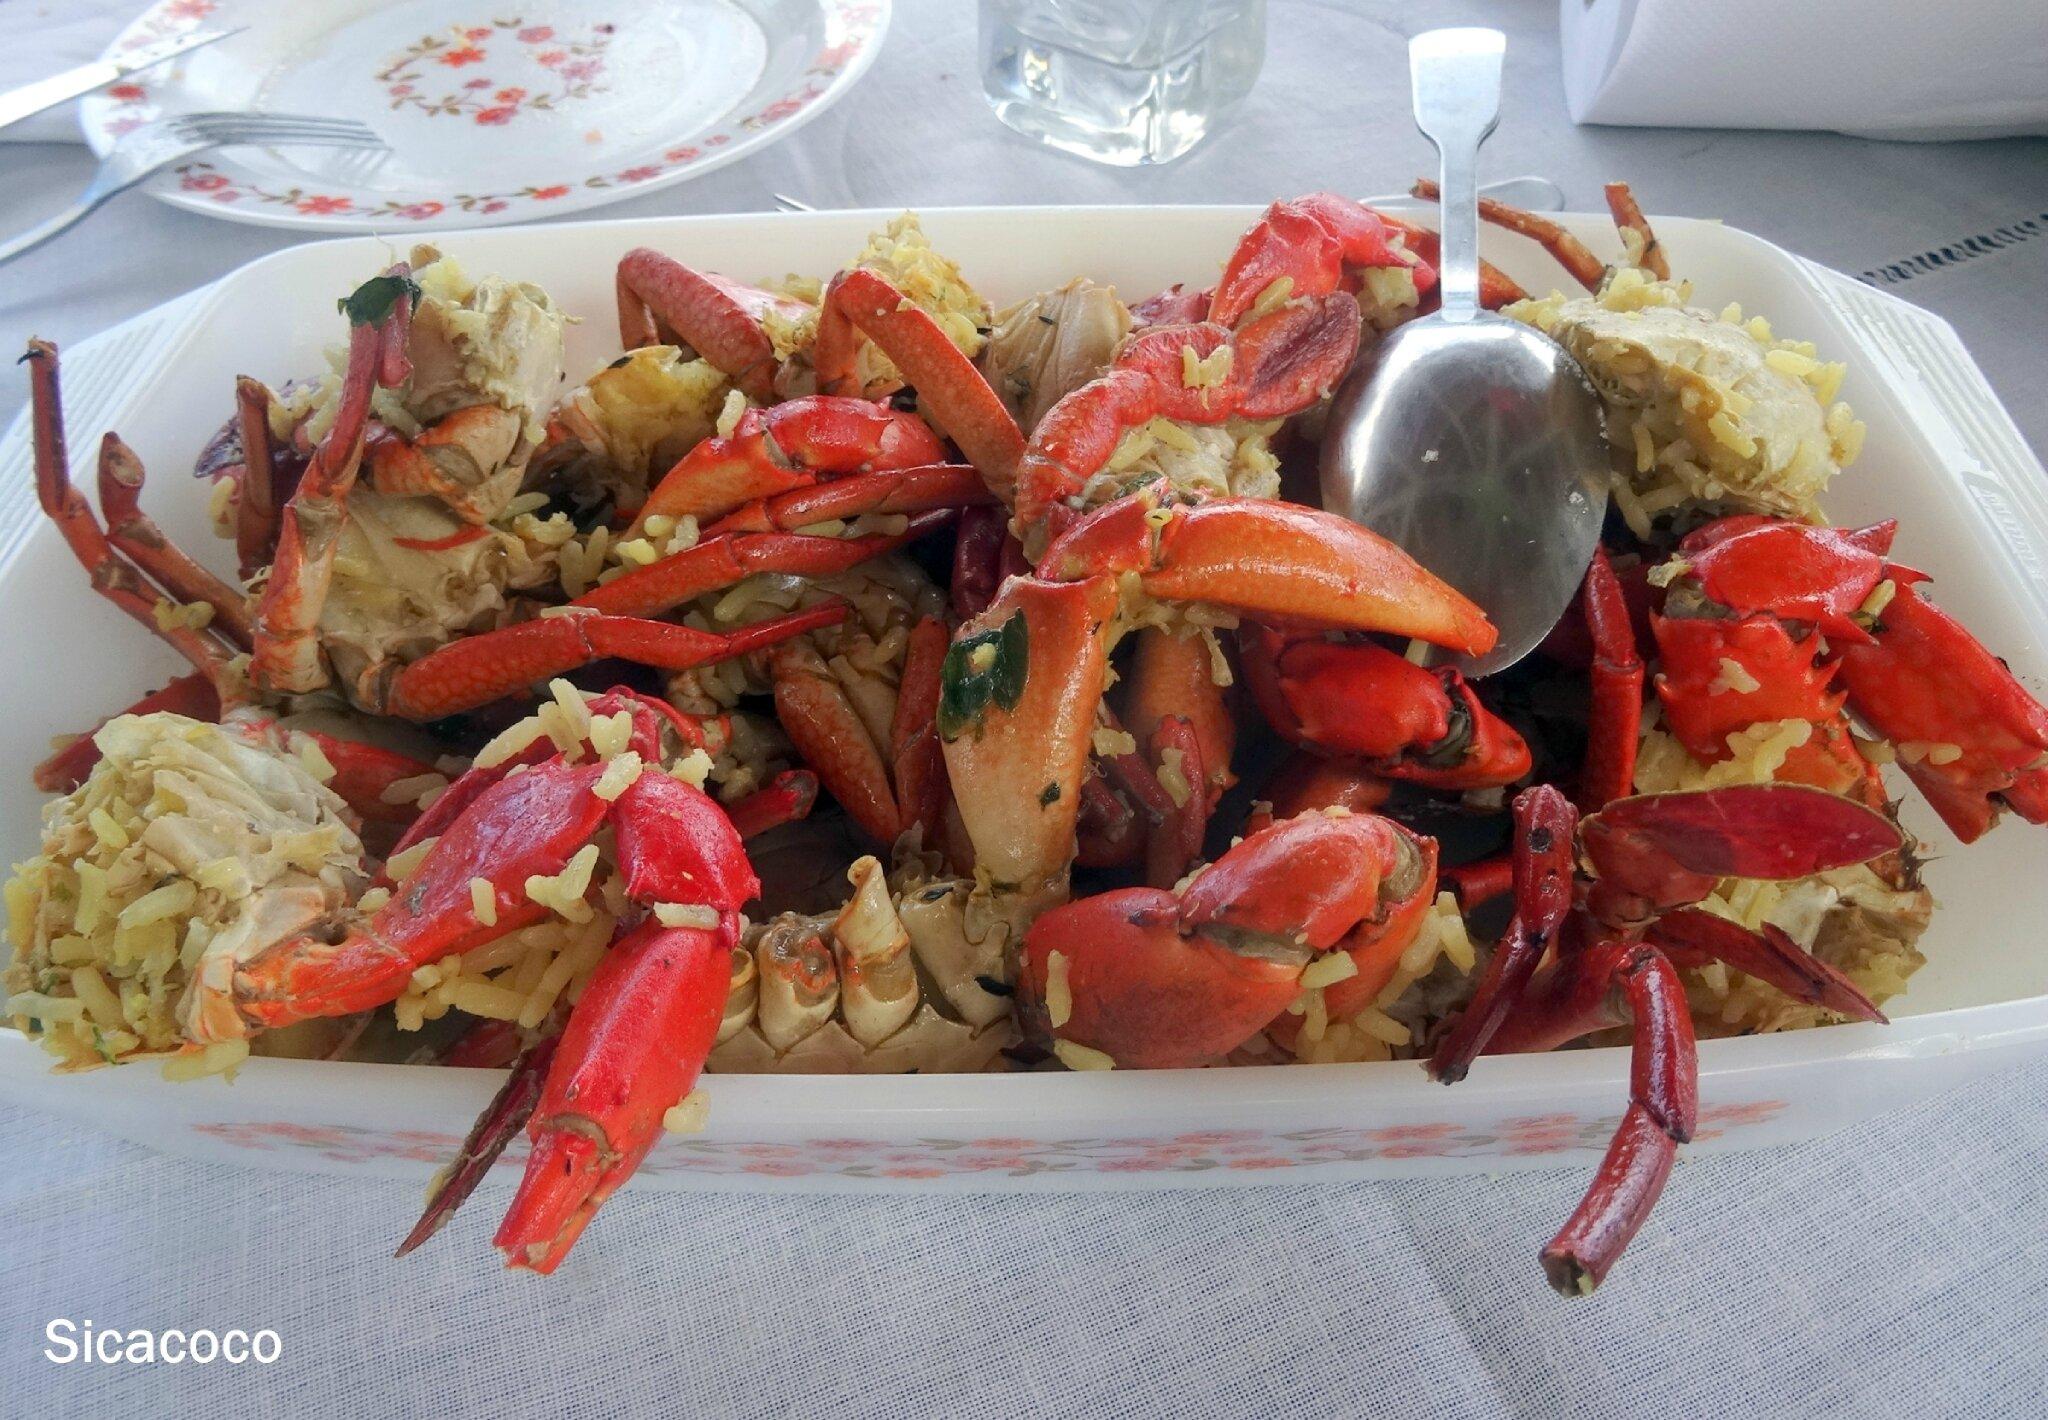 Menu Repas De Noel Antillais.Paques En Guadeloupe Les Carnets De Sicacoco